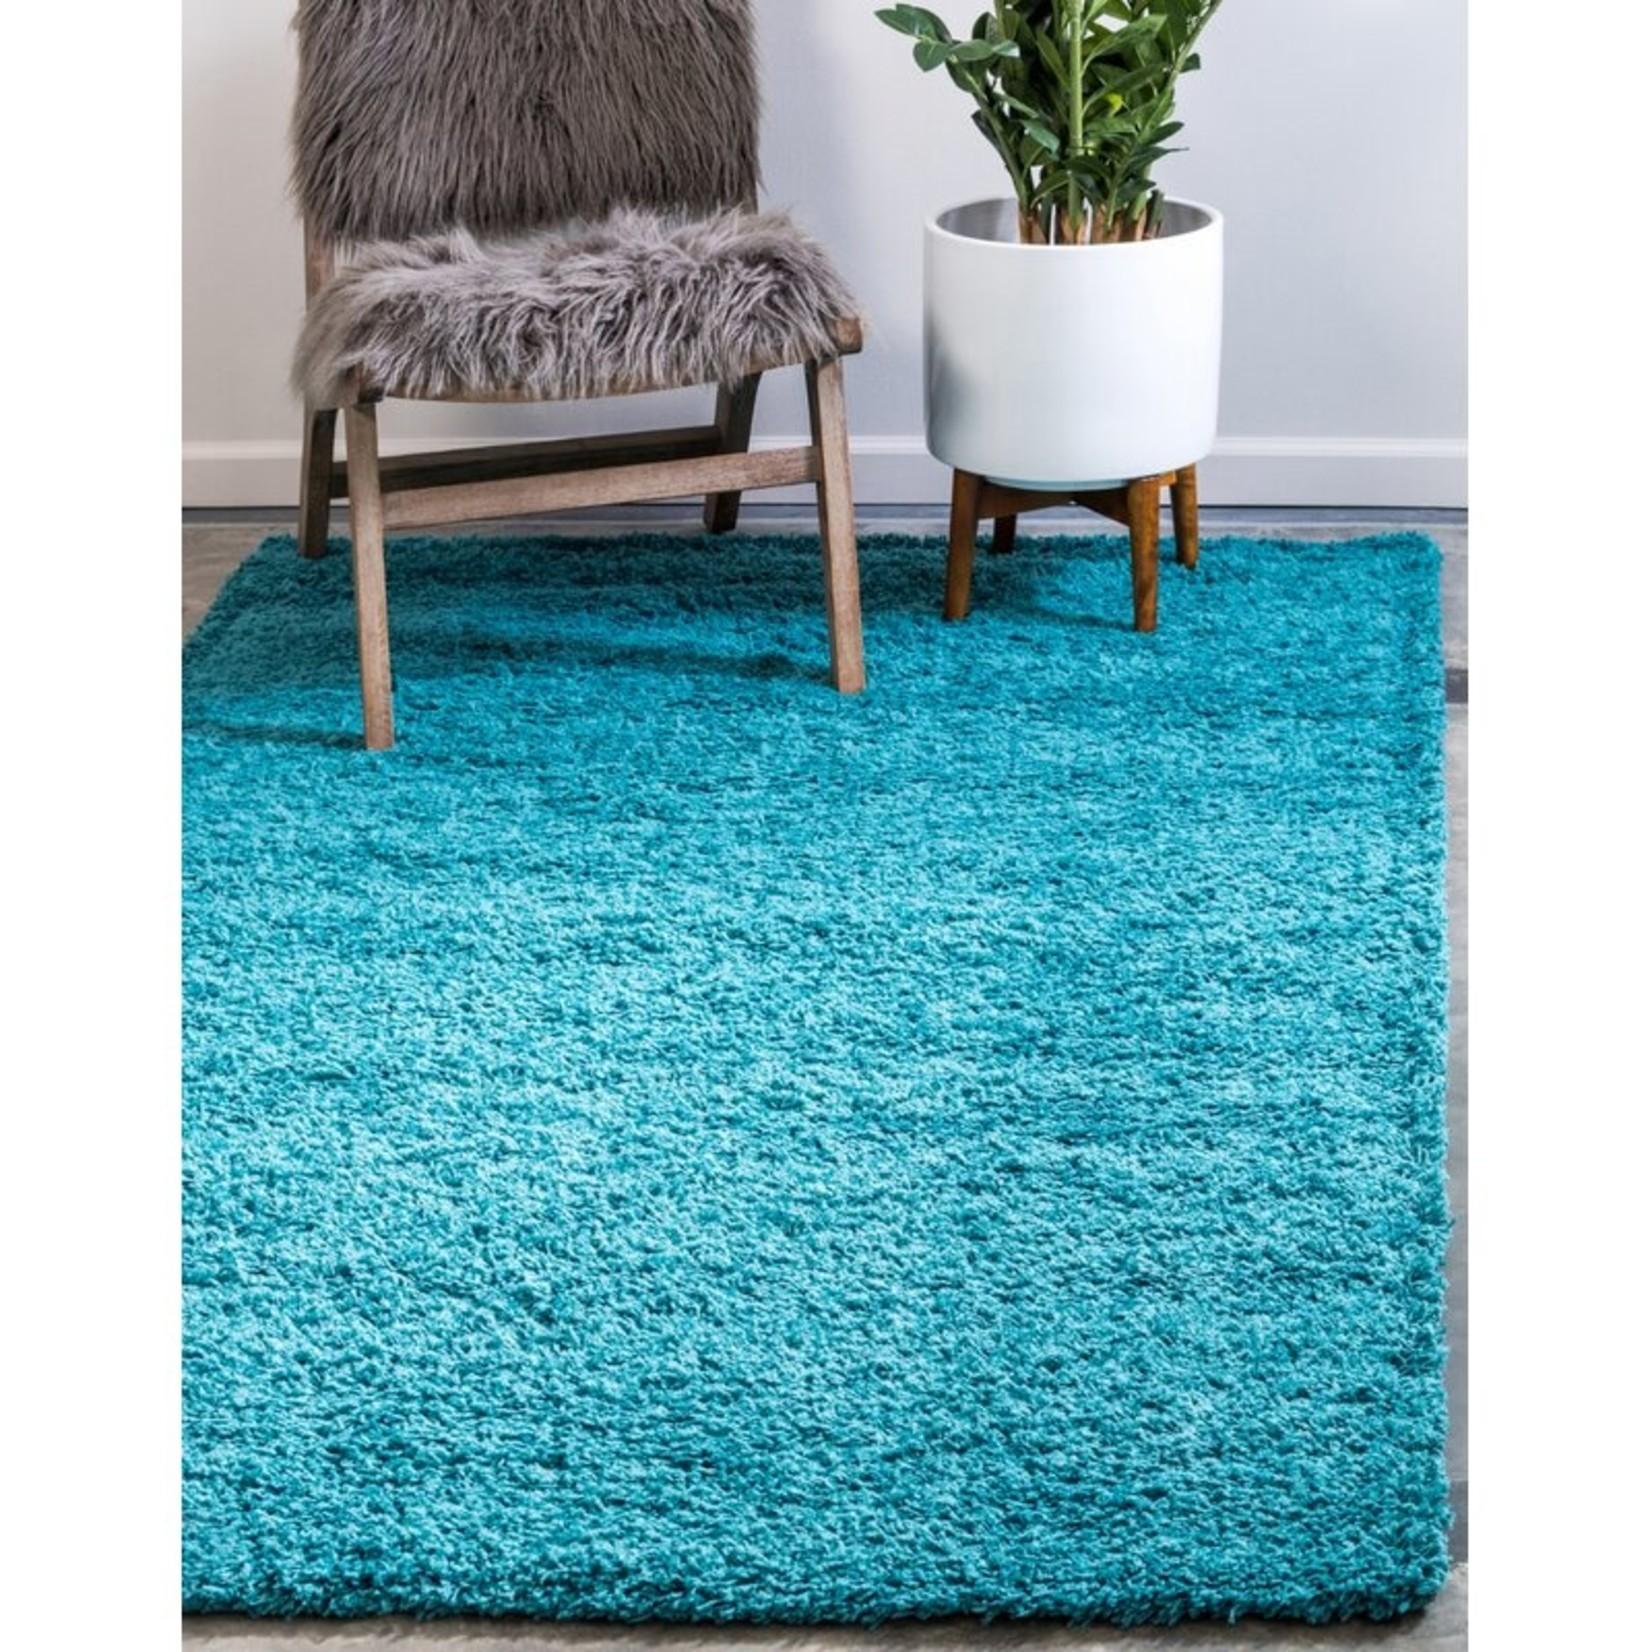 *8' x 10' - Mccoppin Deep Aqua Blue Area Rug